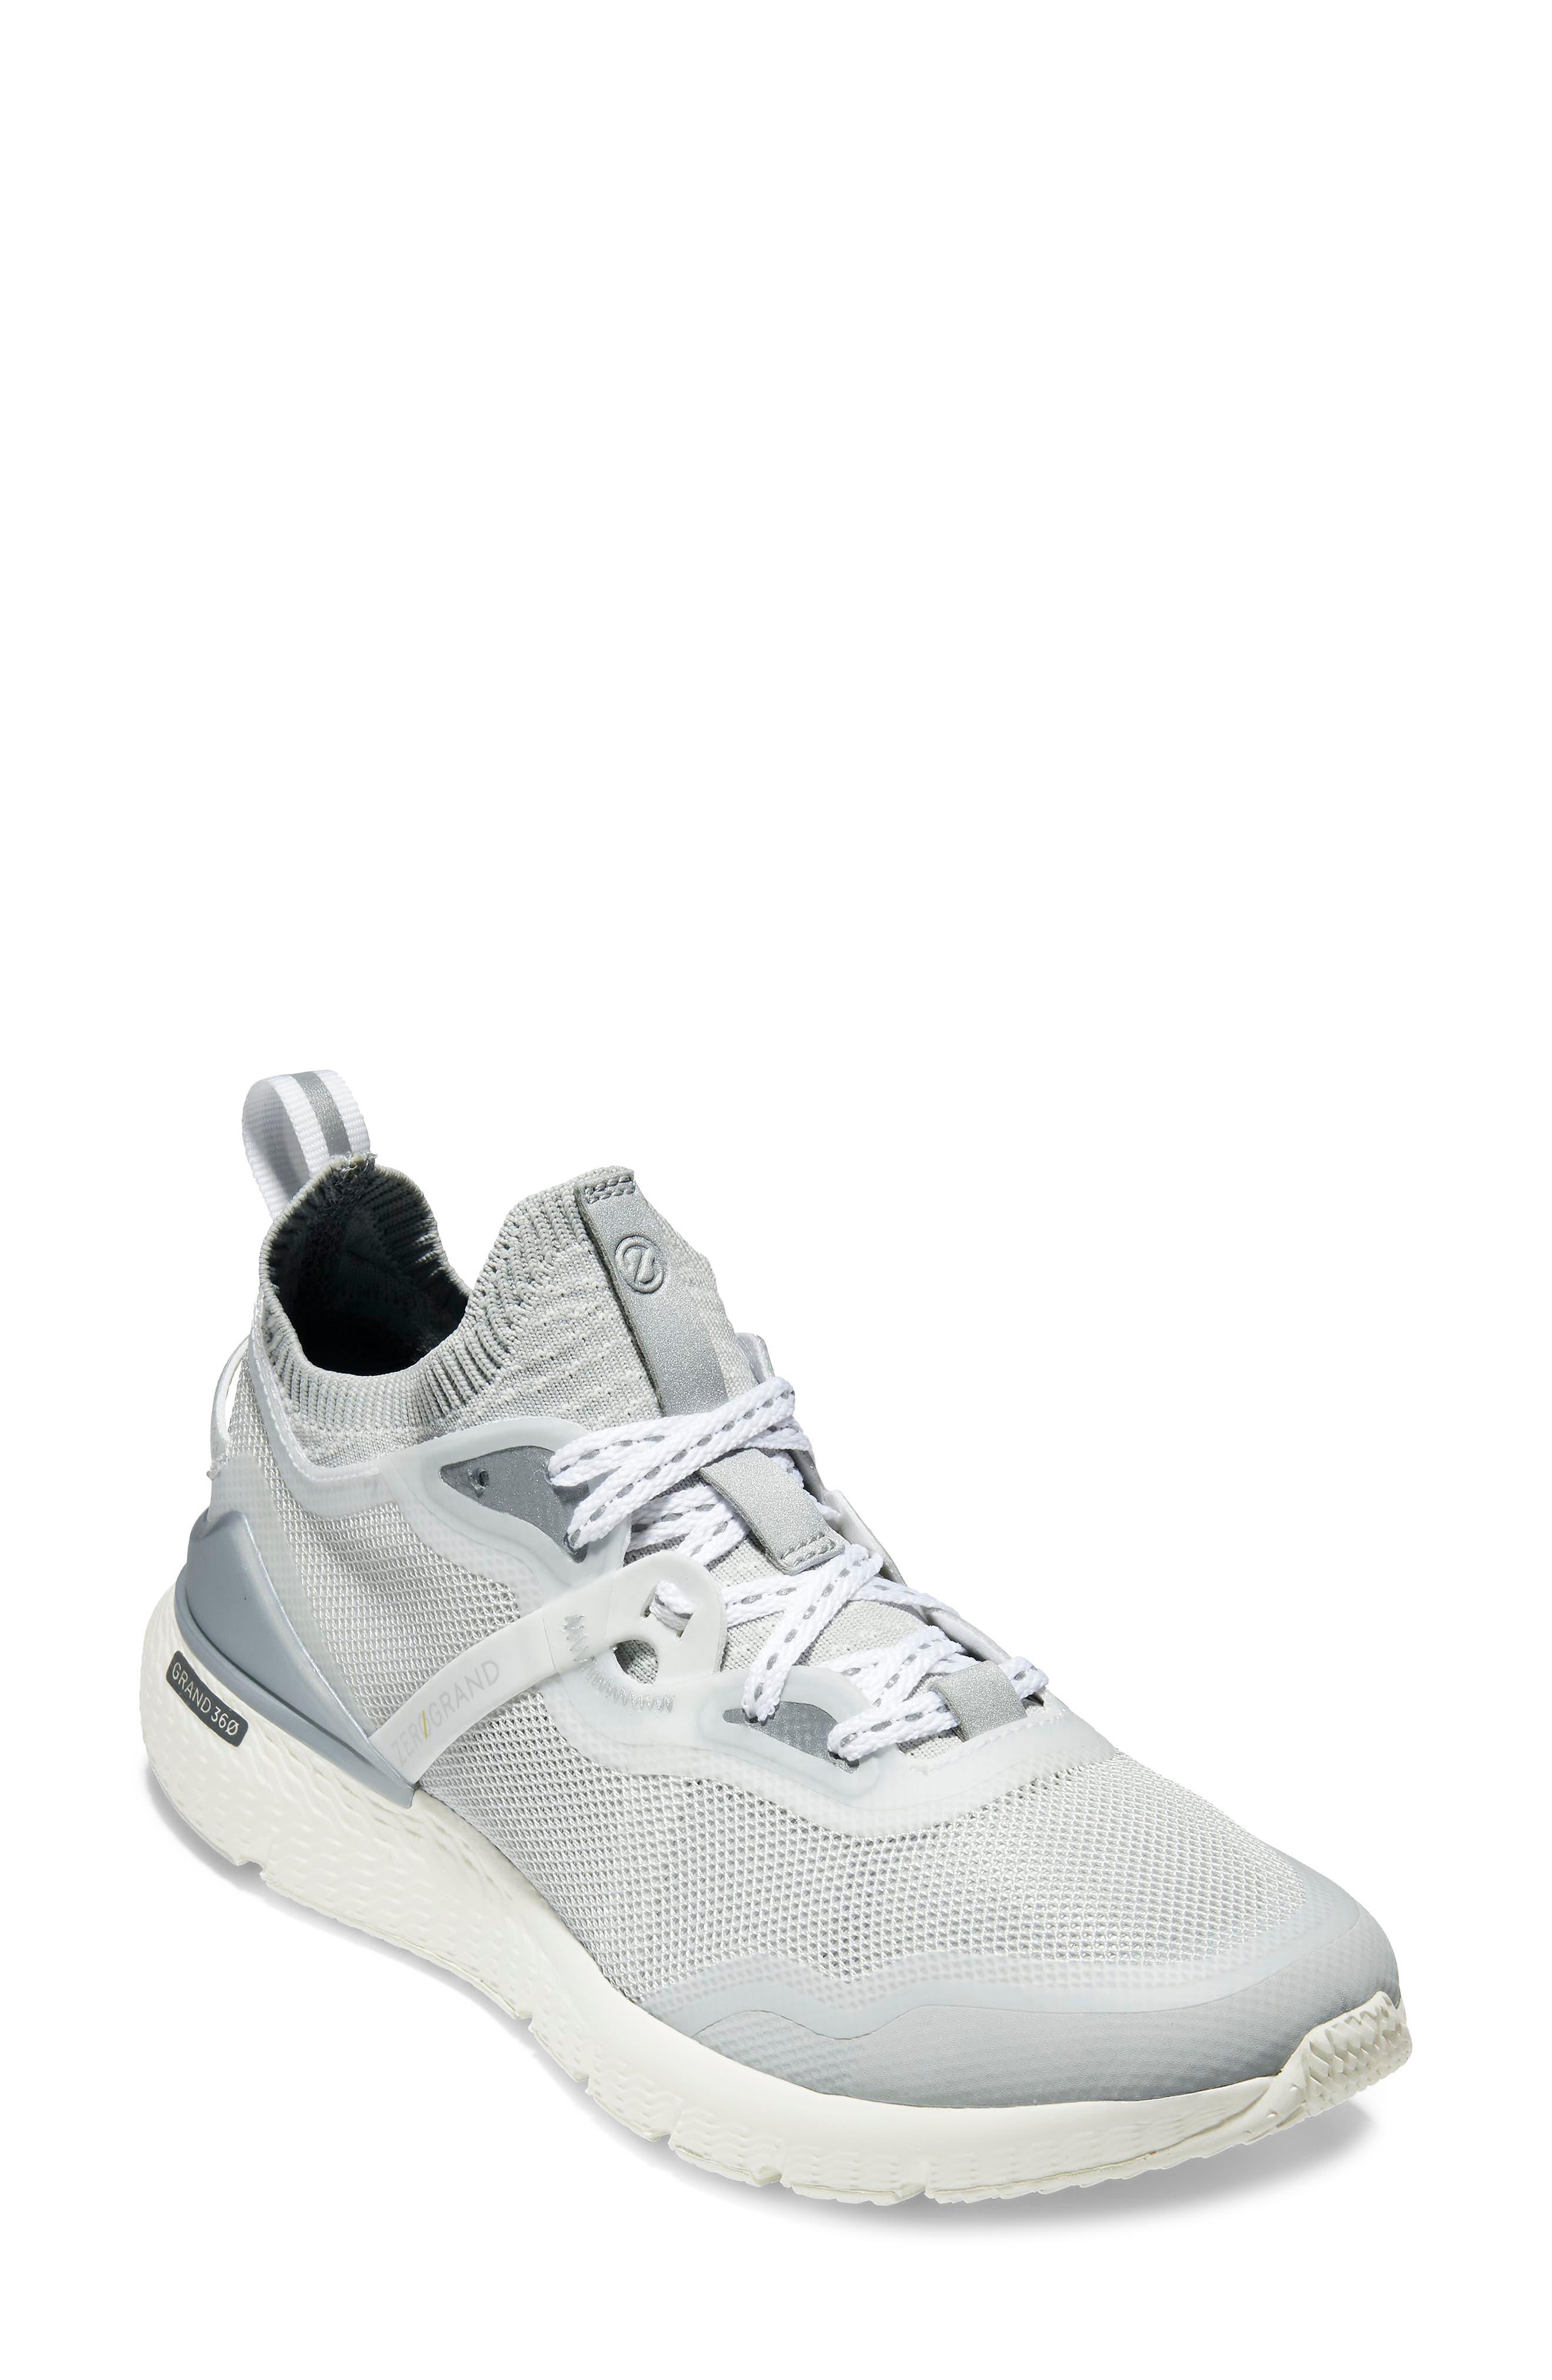 Women's Cole Haan Sneakers \u0026 Athletic